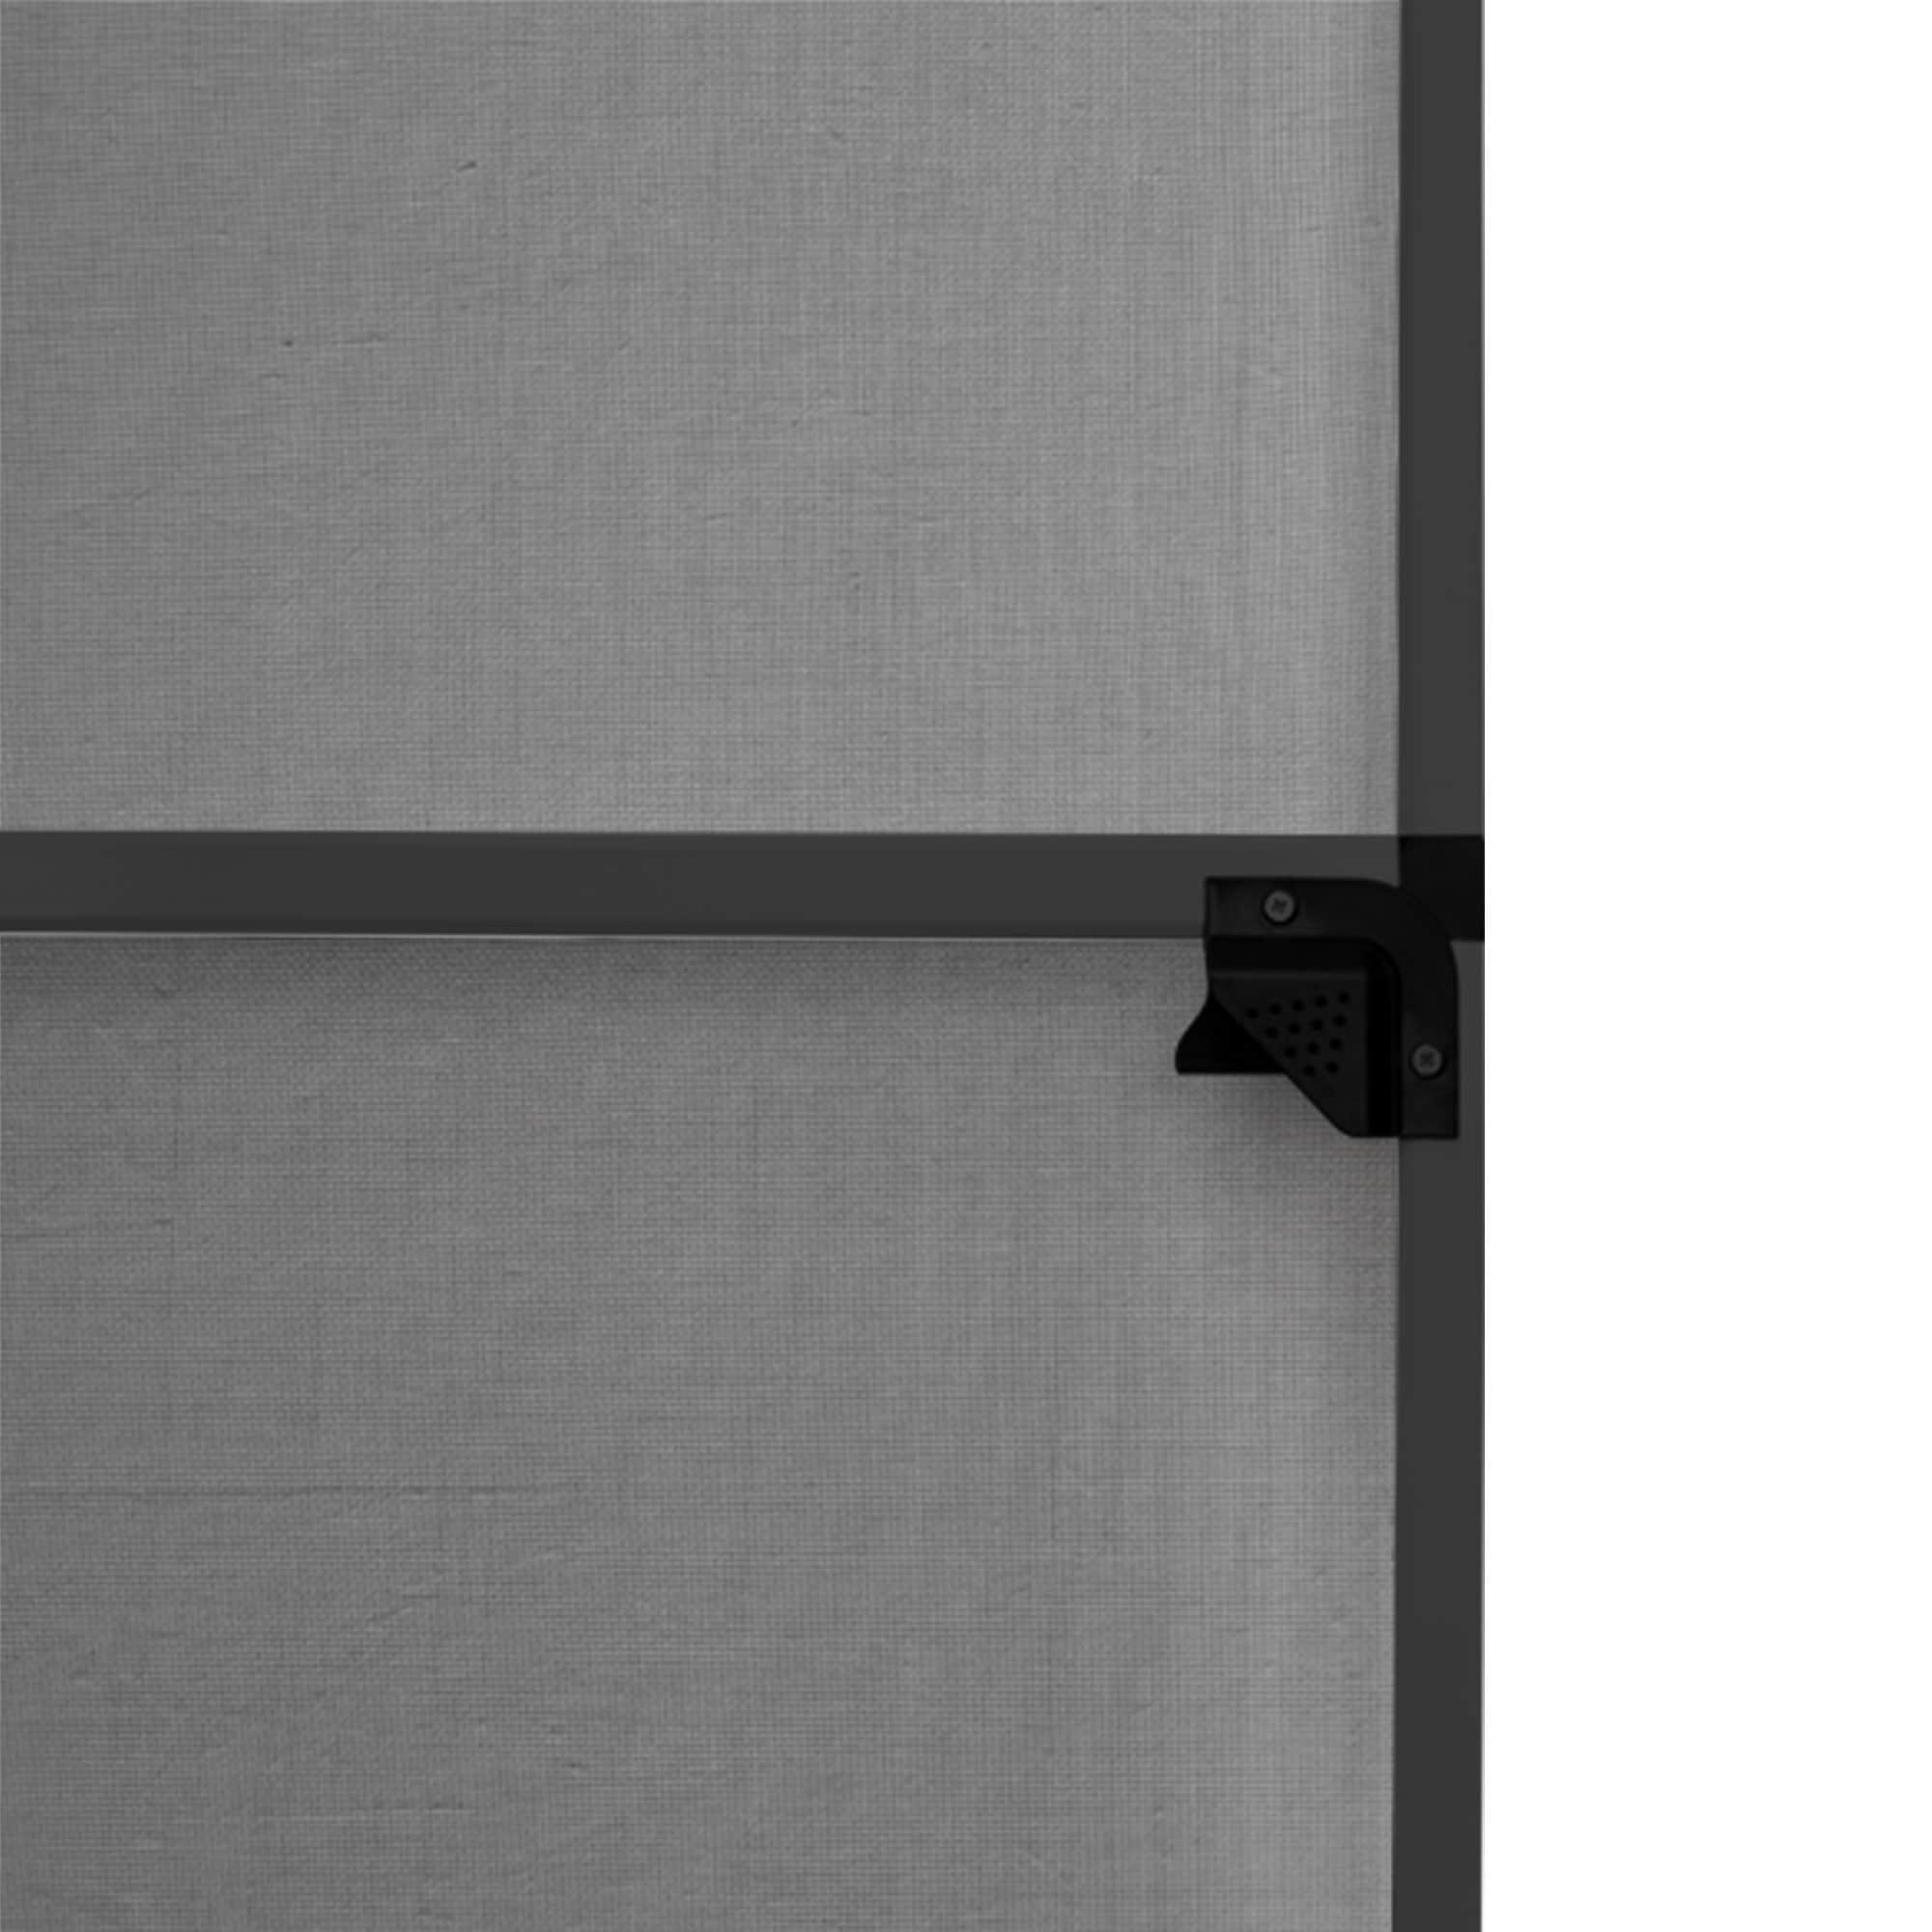 Fliegengitter-Tuerrahmen-Insektenschutz-Tuer-Drehrahmen-Rahmen-Tuergitter-120x220cm Indexbild 16